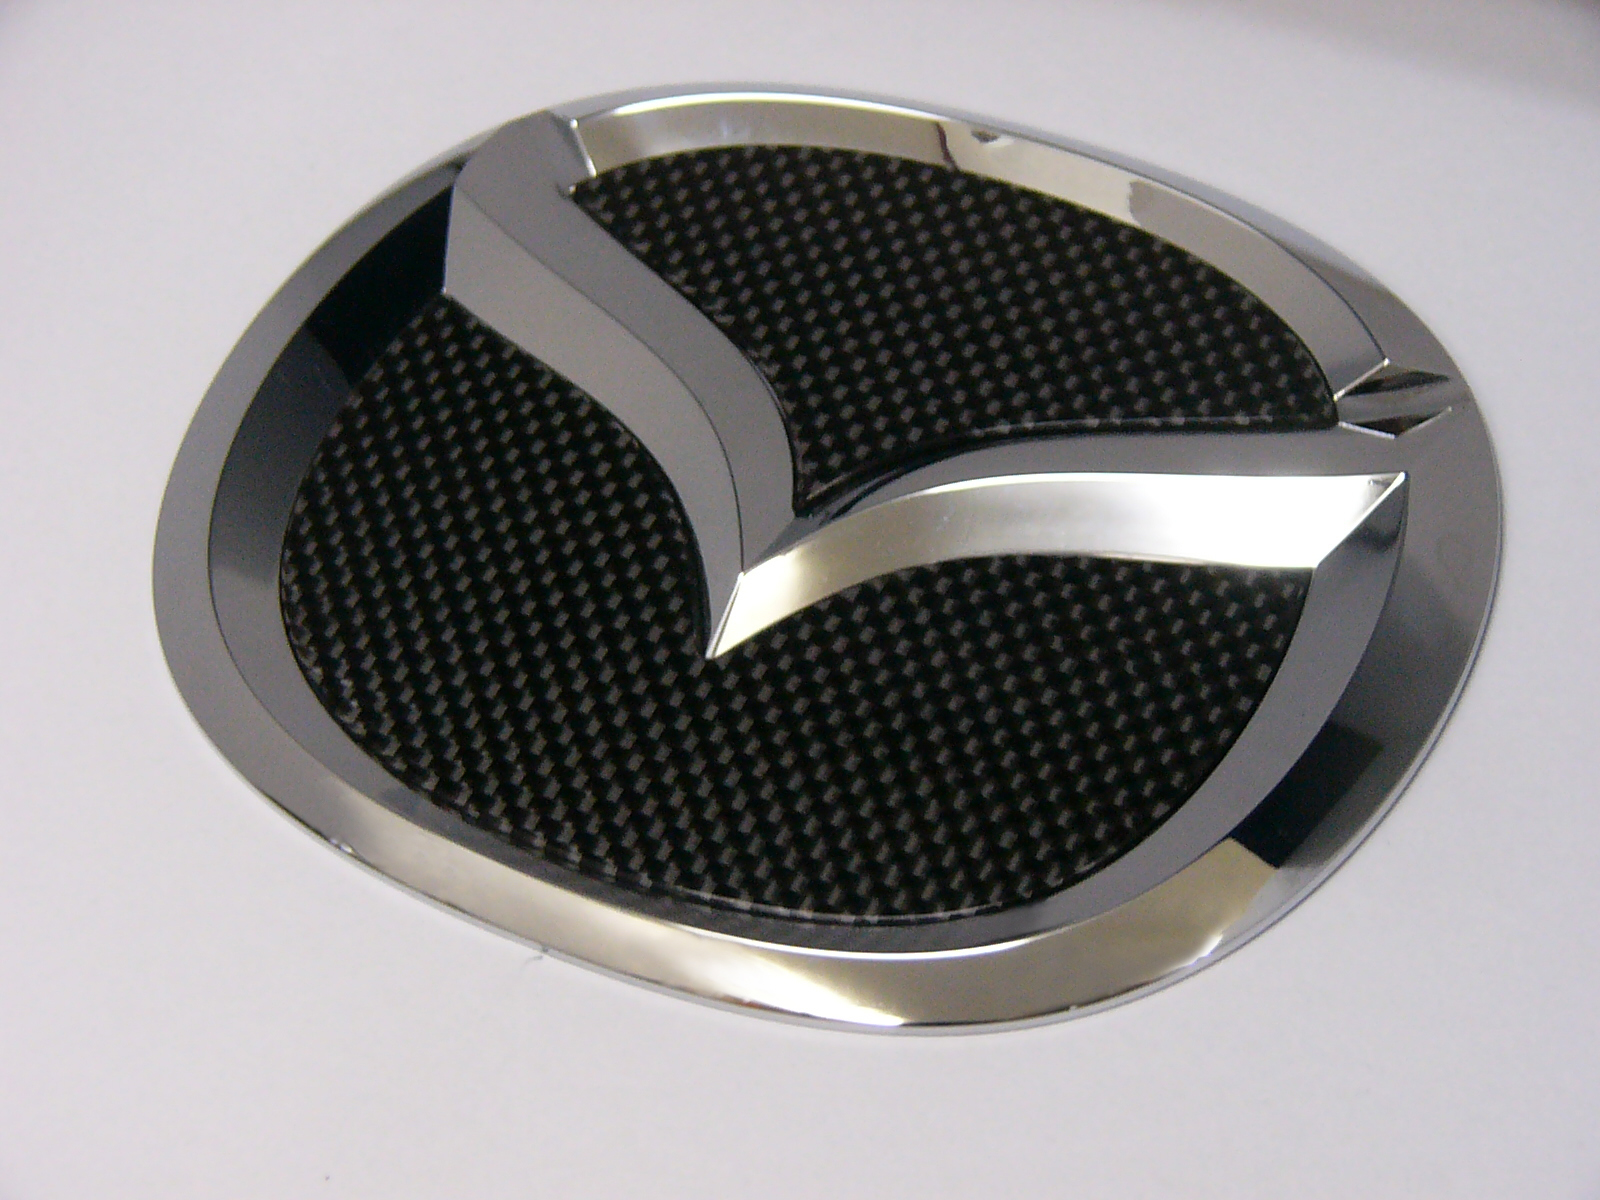 MAZDA CX7・MPV・プレマシー専用リヤエンブレムカーボンフィニッシャー